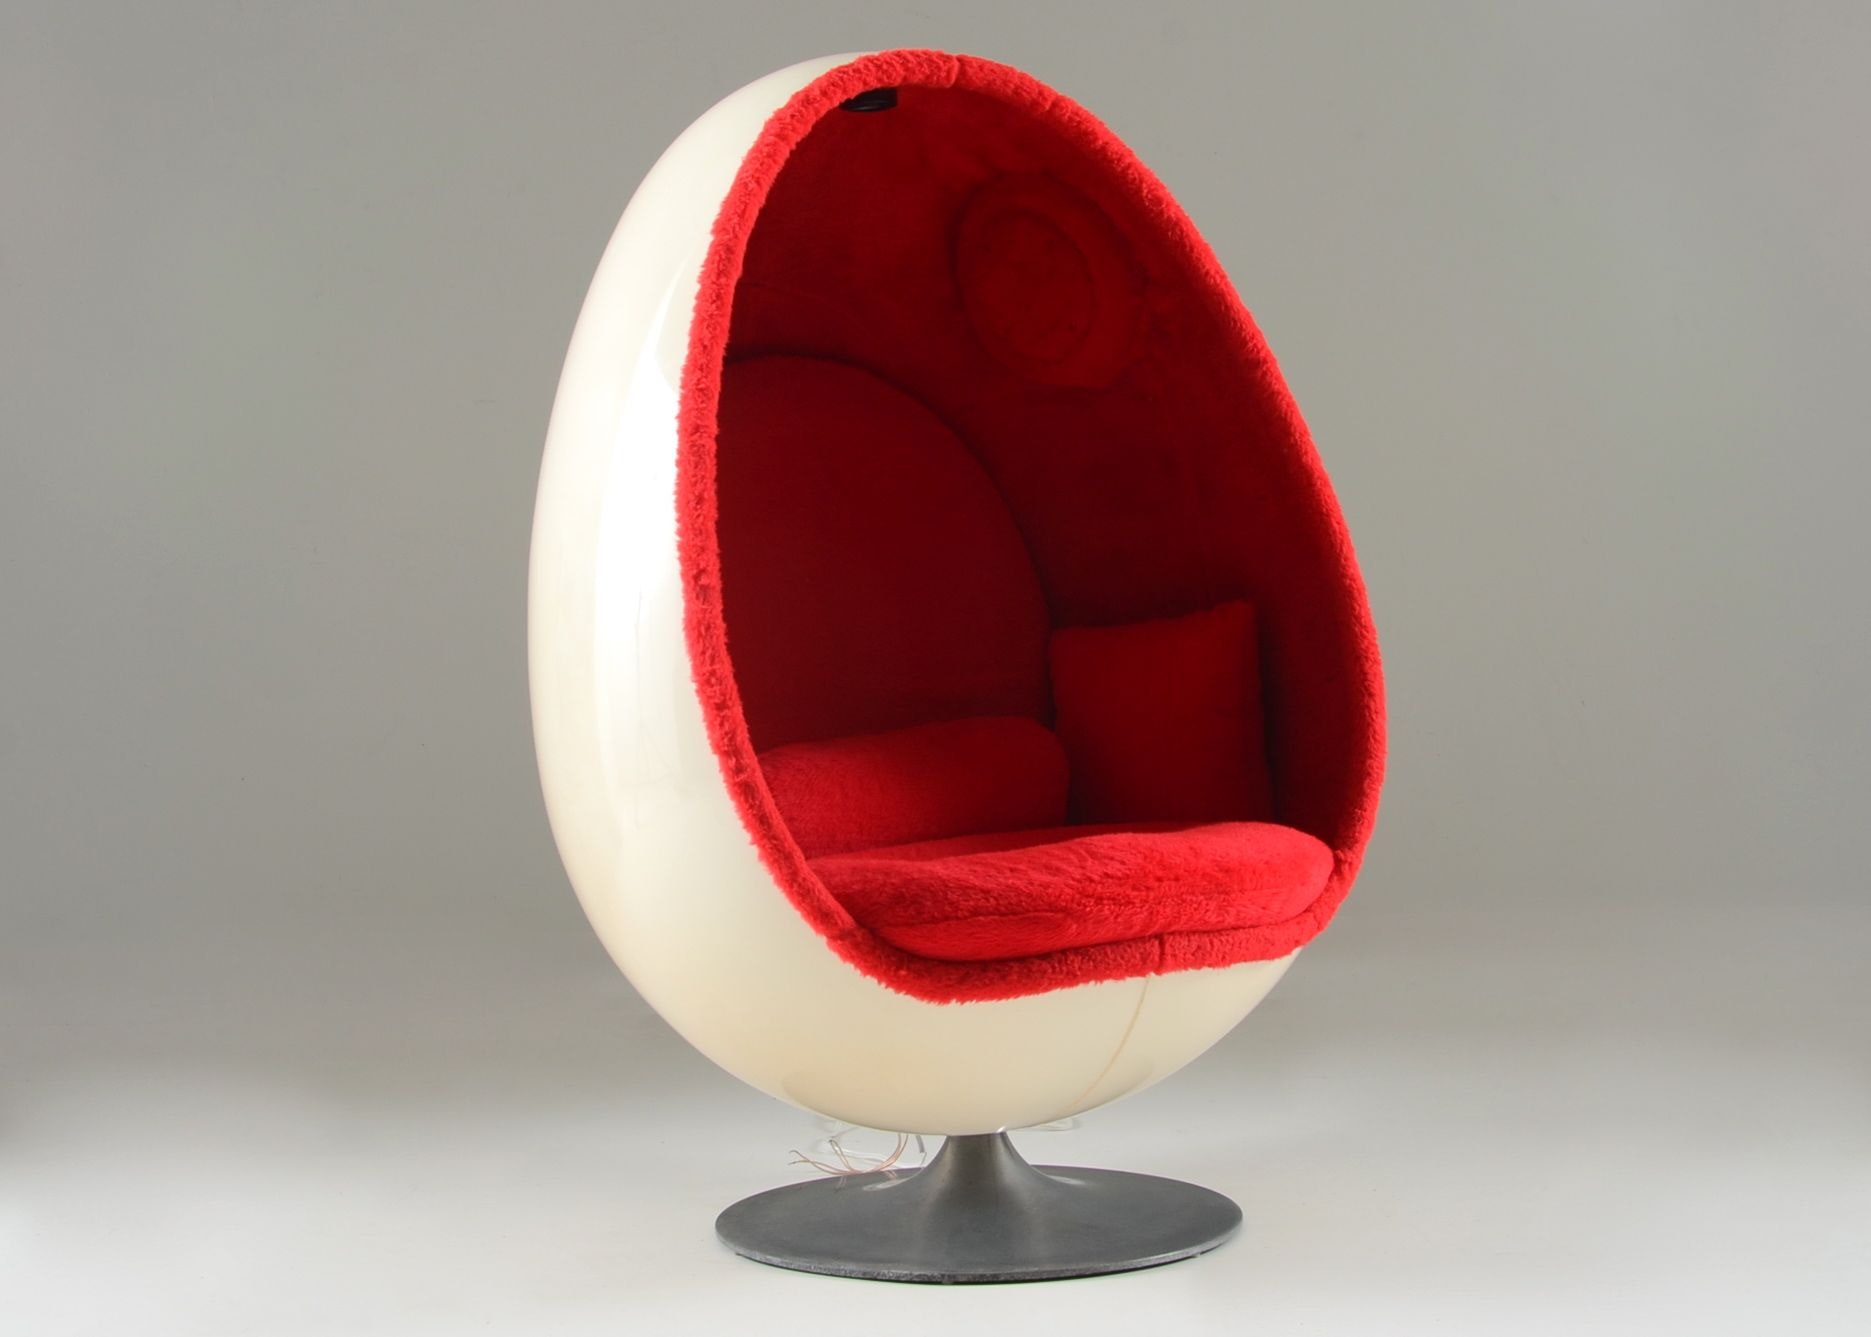 Modern Furniture Auction danish modern furniture auction – kisupo